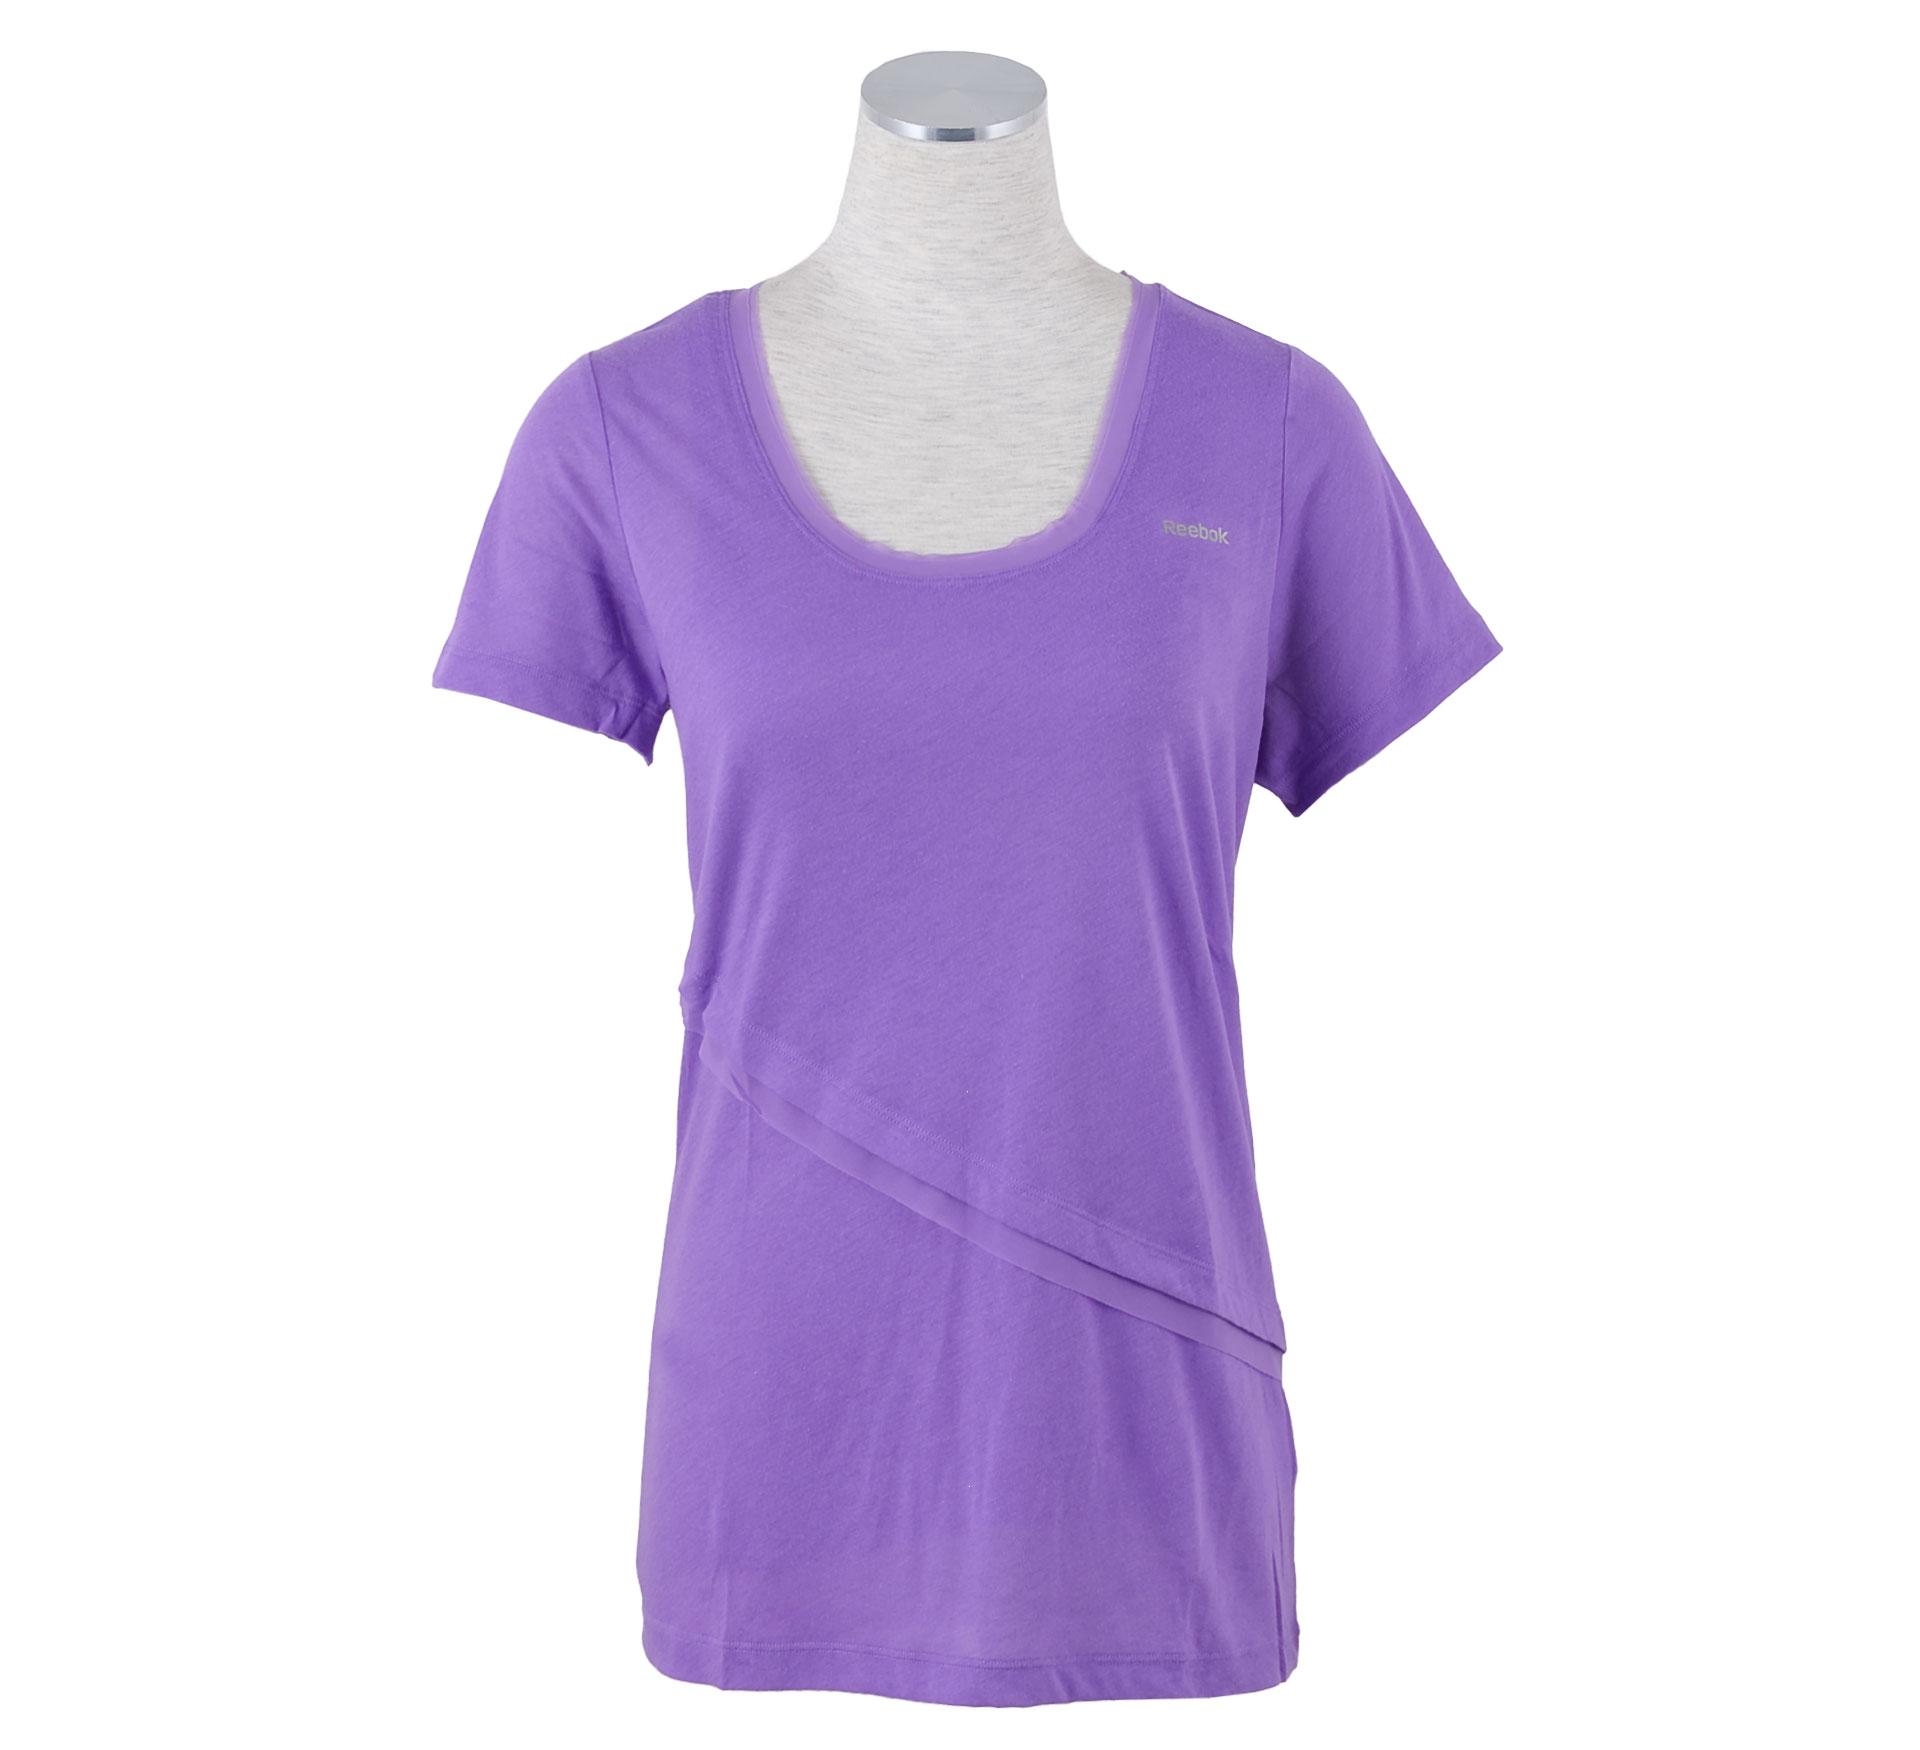 Reebok ShapeWear Double Layer T-shirt Dames paars